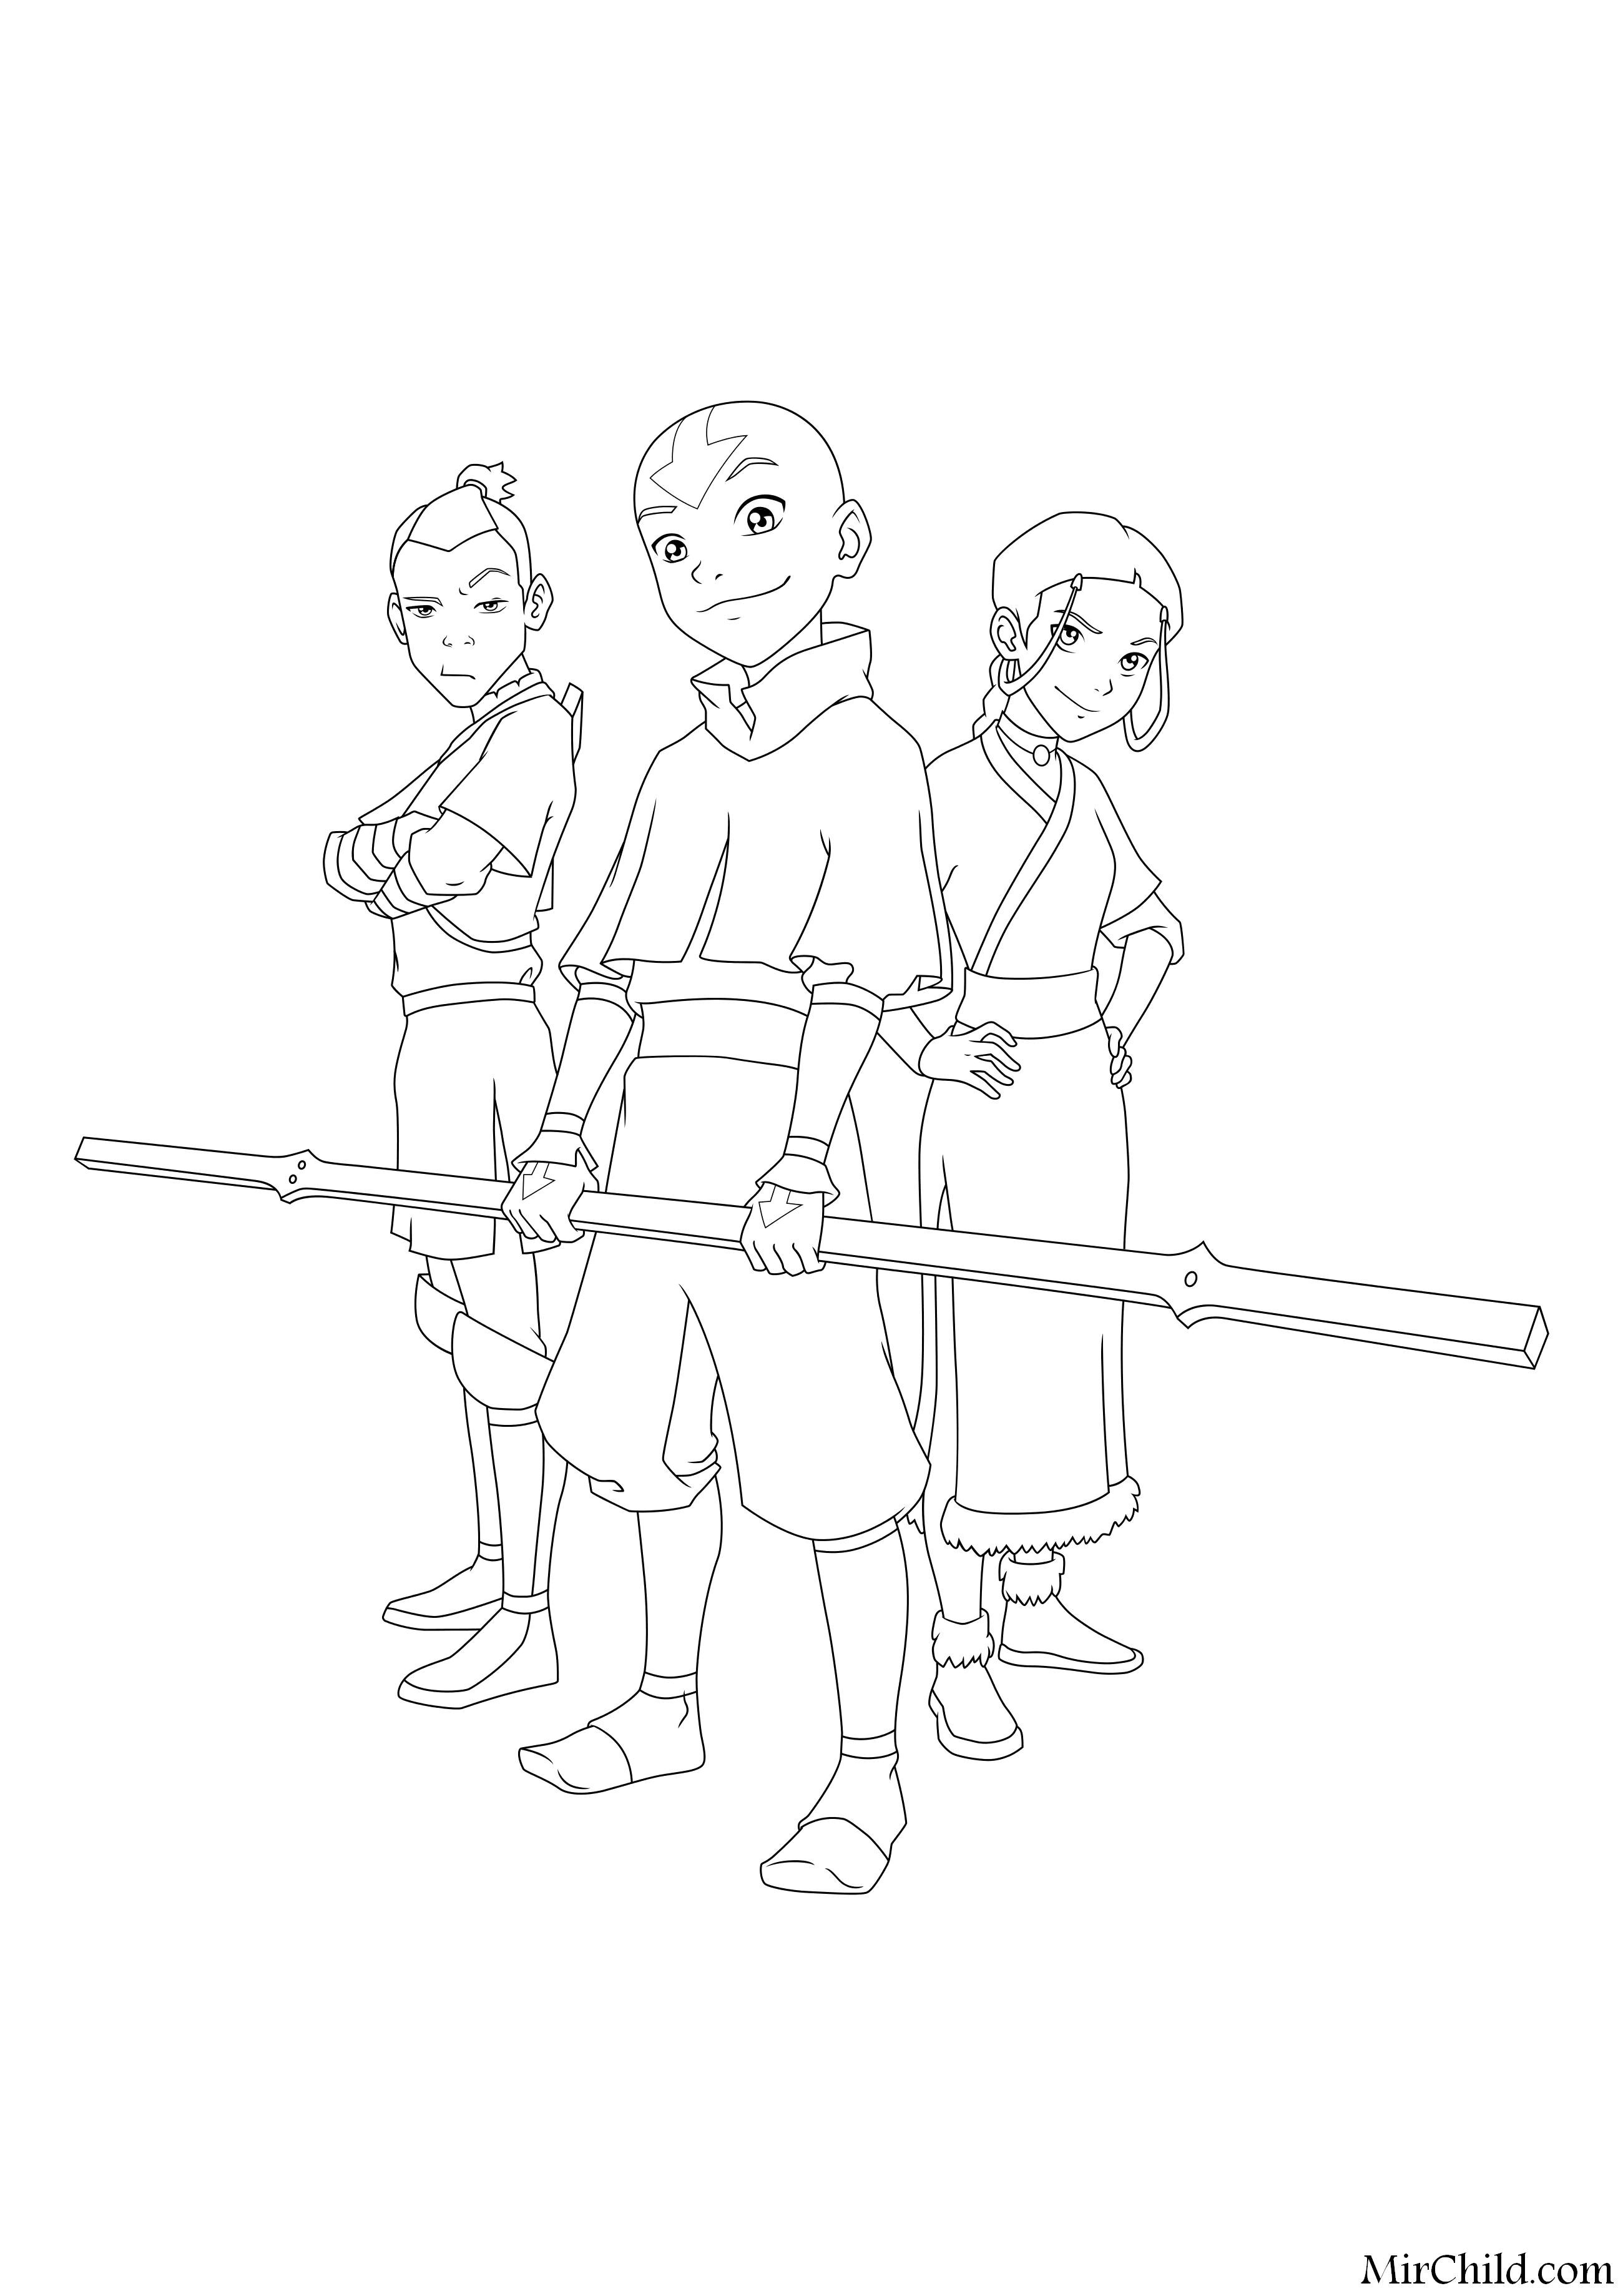 Raskraska Avatar Legenda Ob Aange Sokka Aang I Katara Mirchild